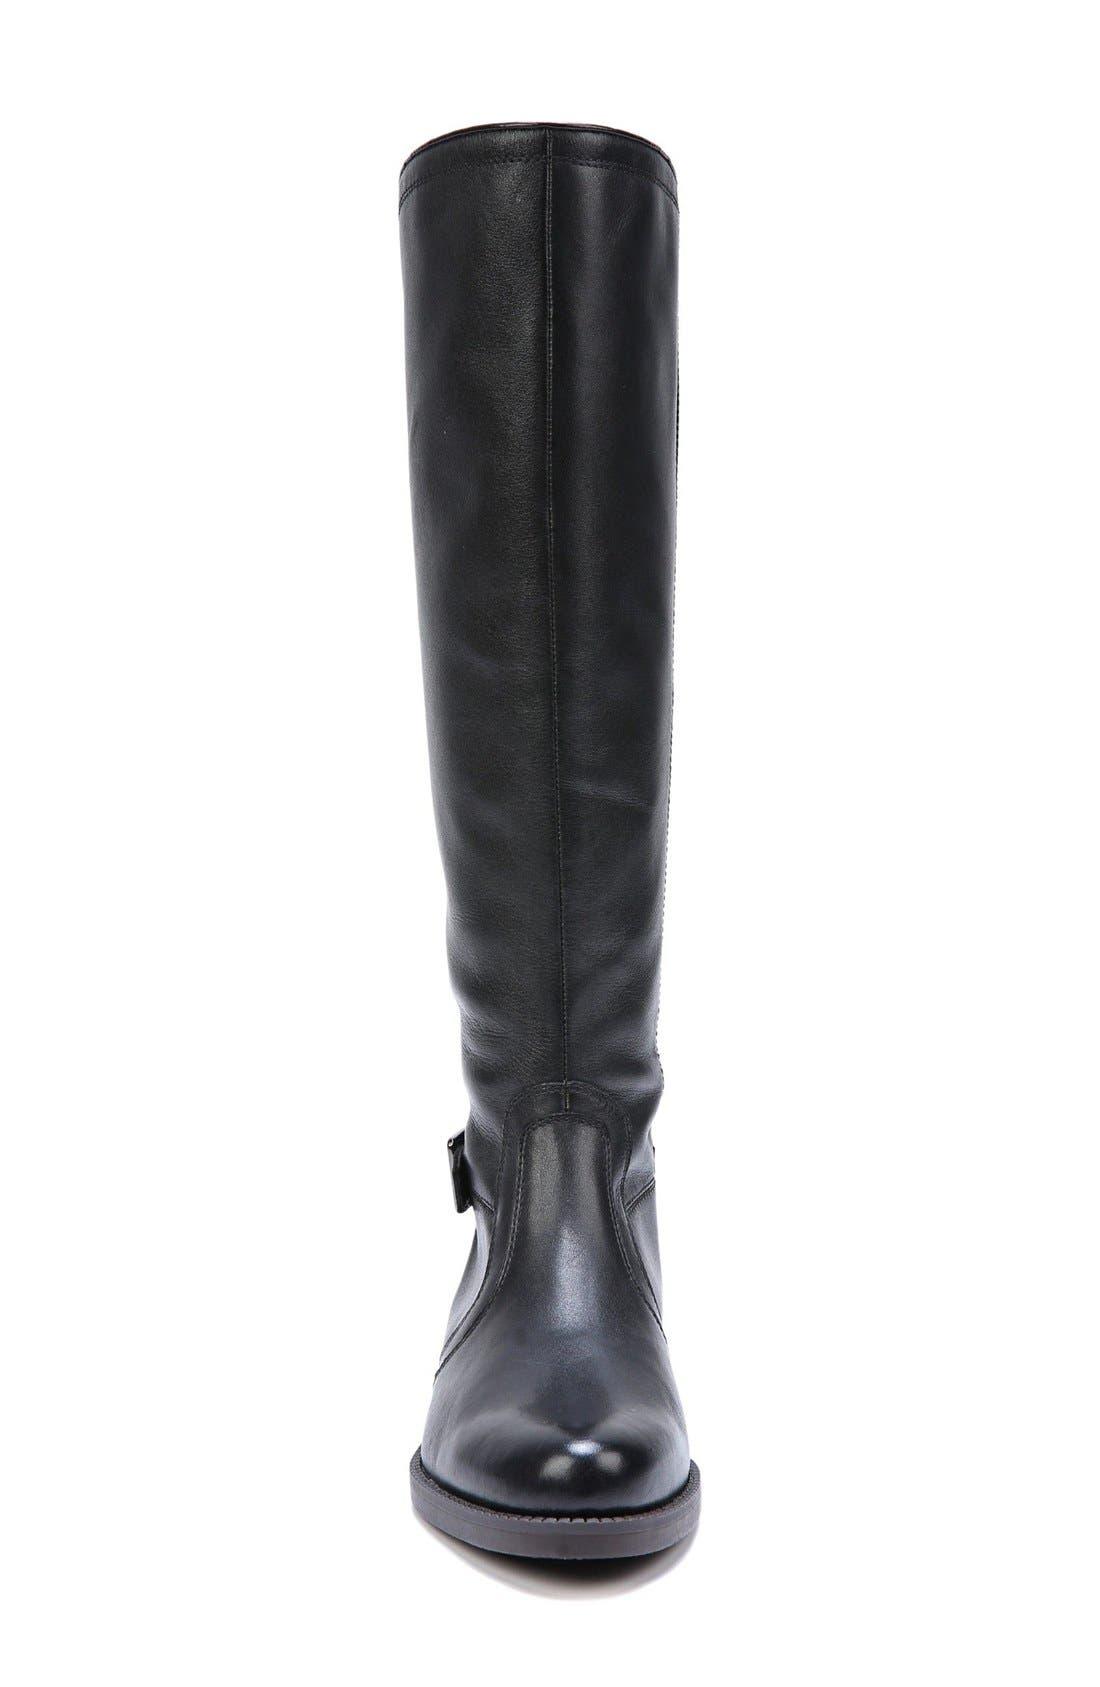 Alternate Image 3  - SARTO by Franco Sarto Carlana Riding Boot (Women) (Wide Calf)